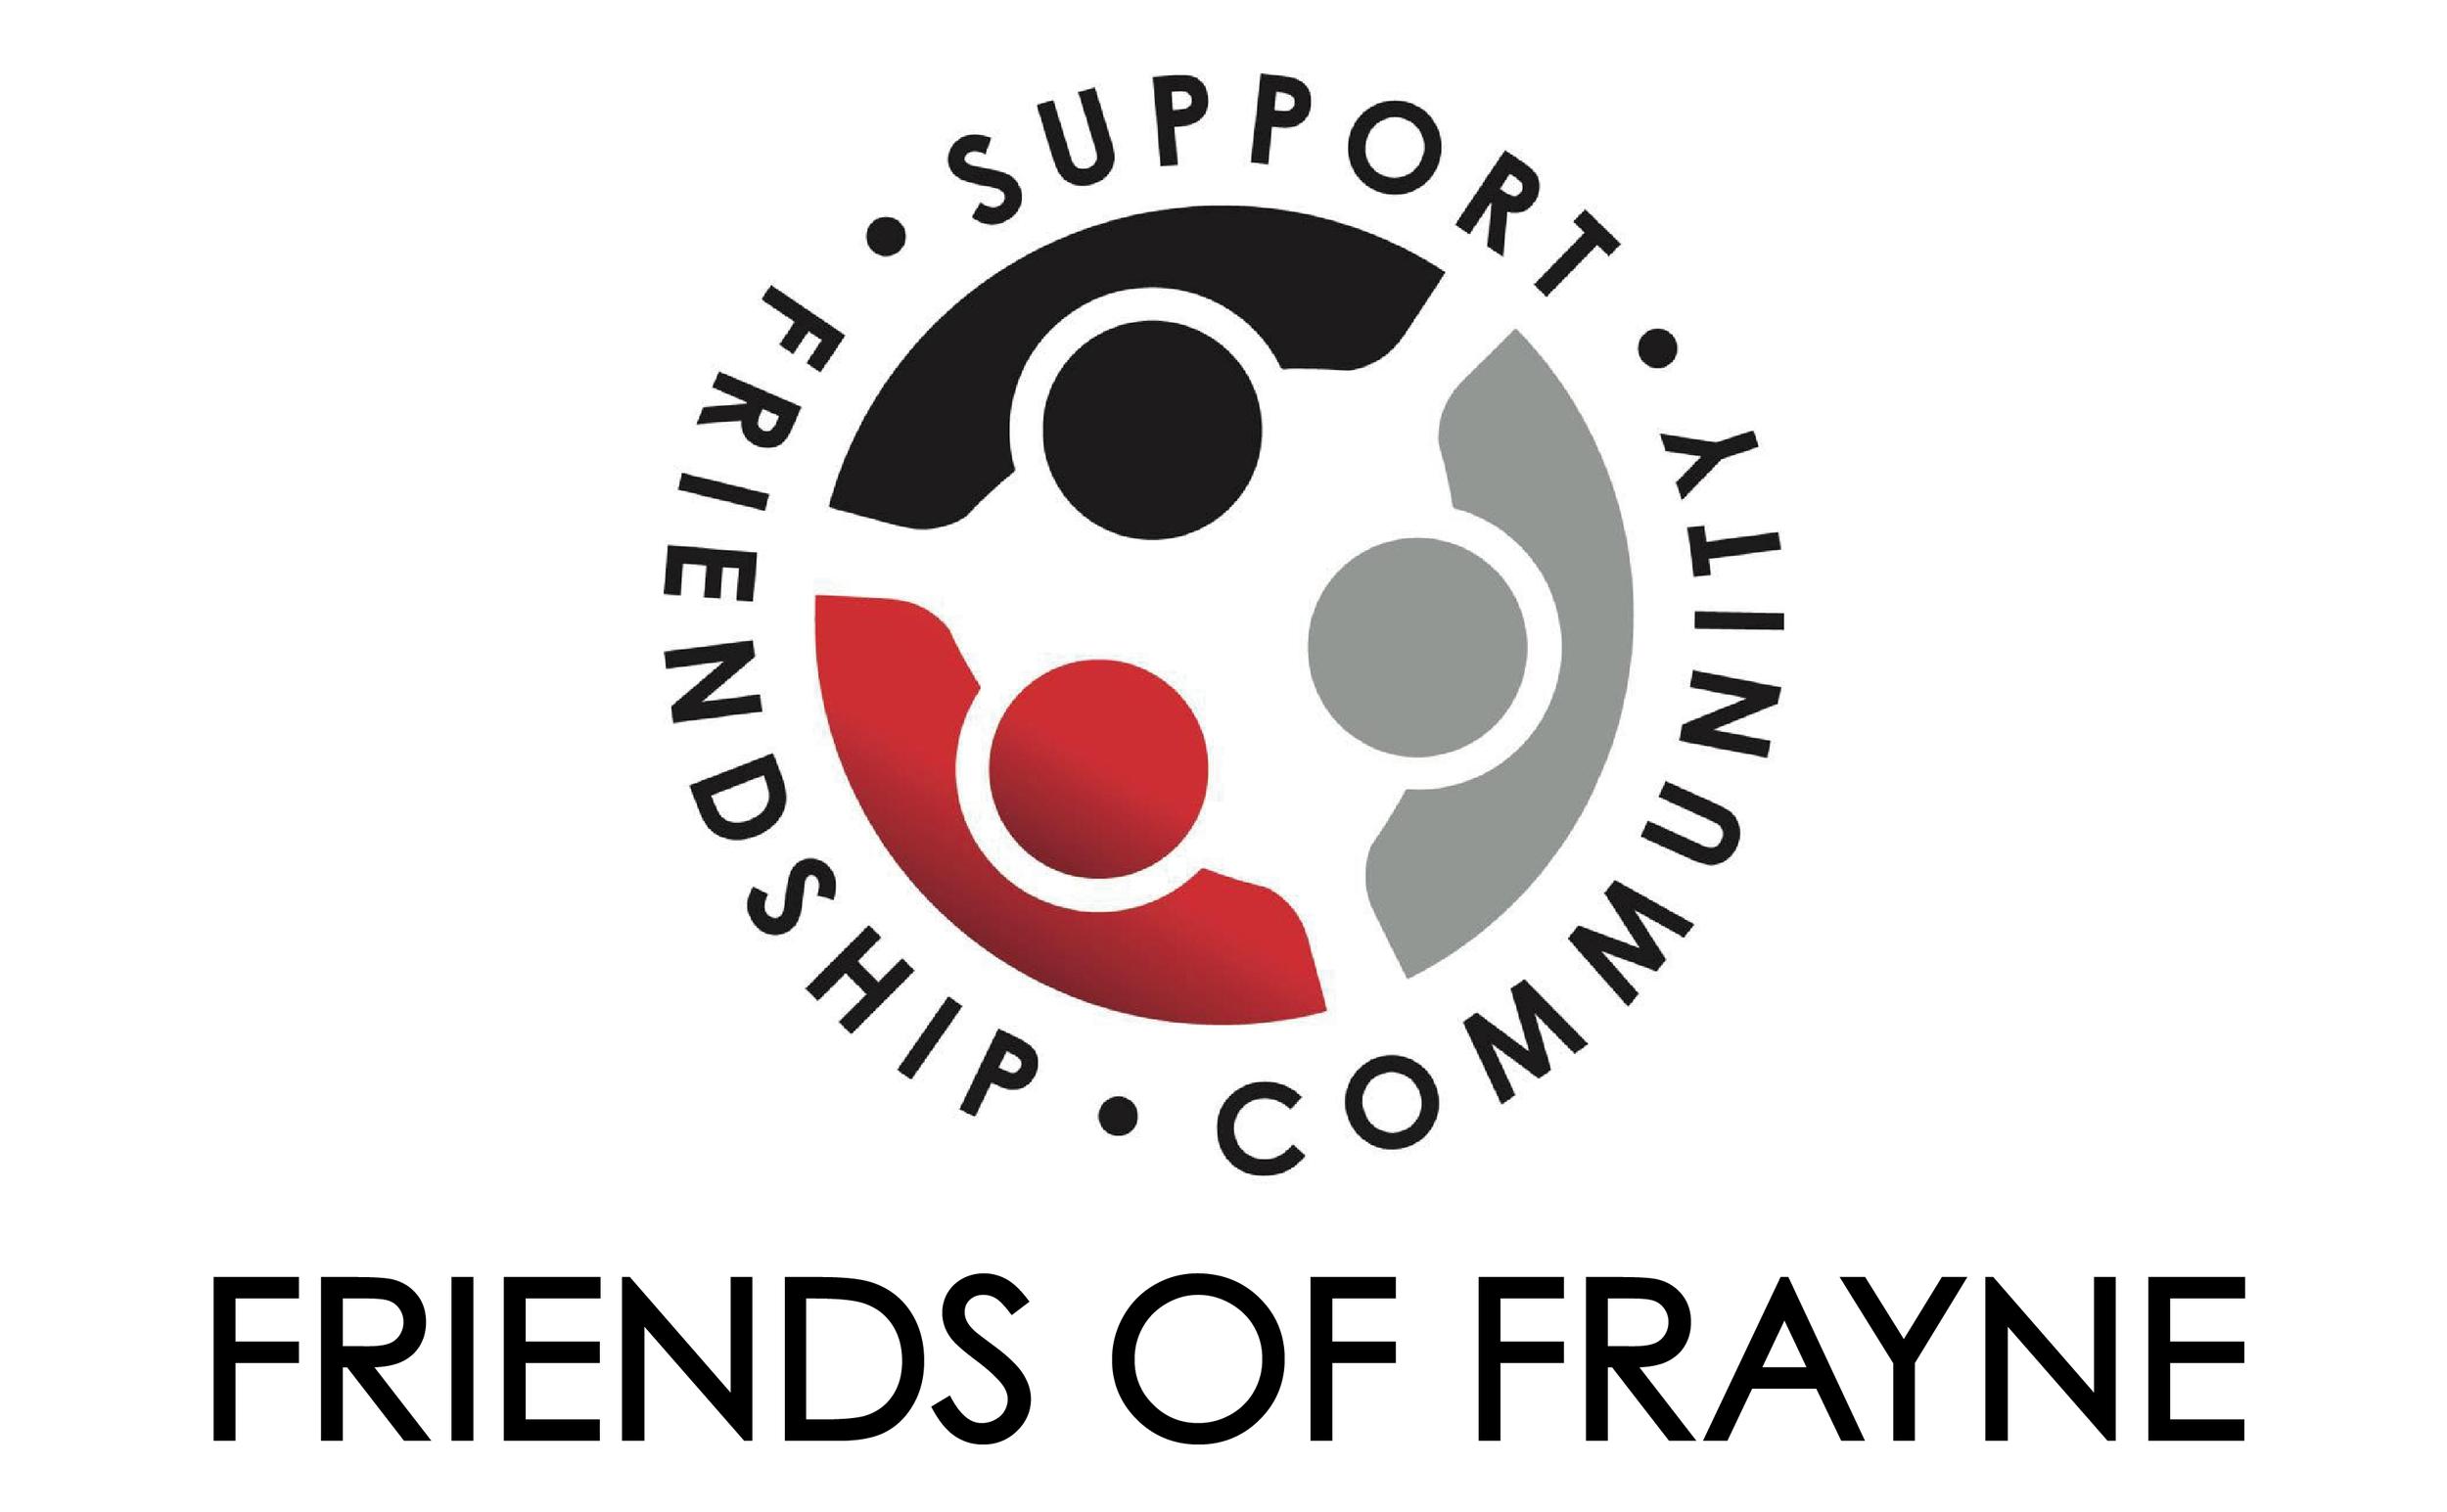 Friends of Frayne